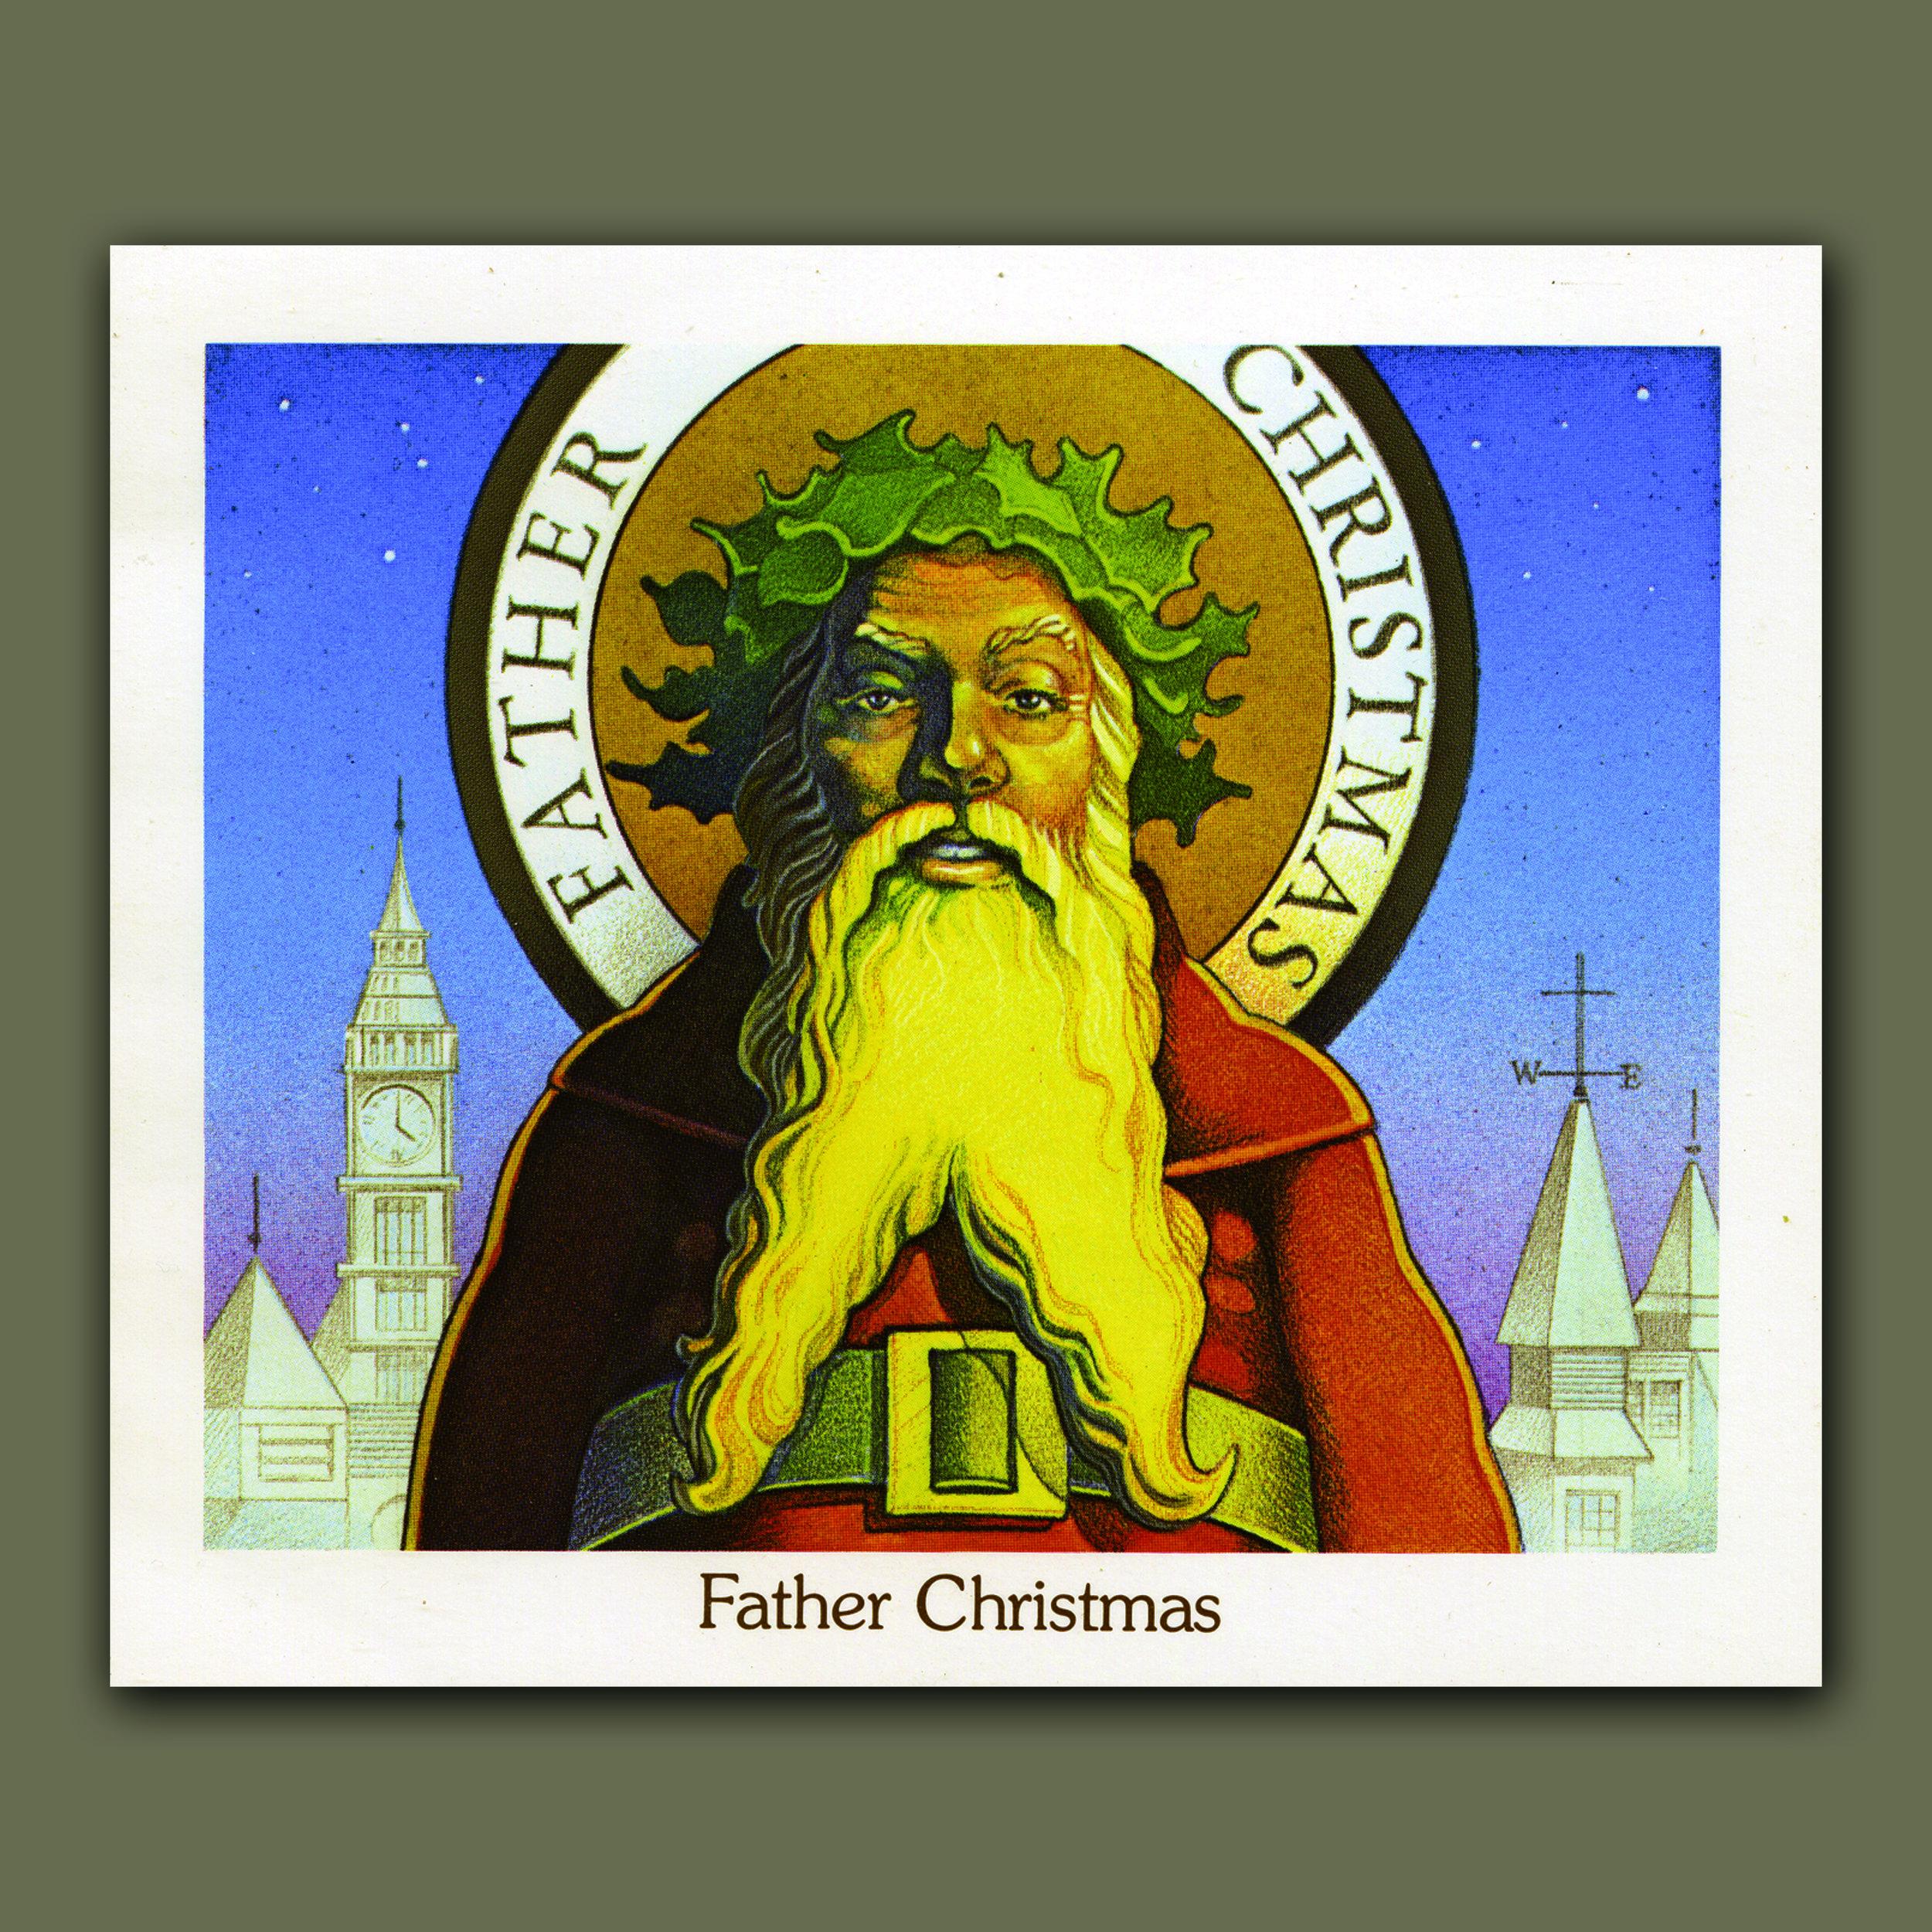 Father Christmas-'70's Illus.jpg